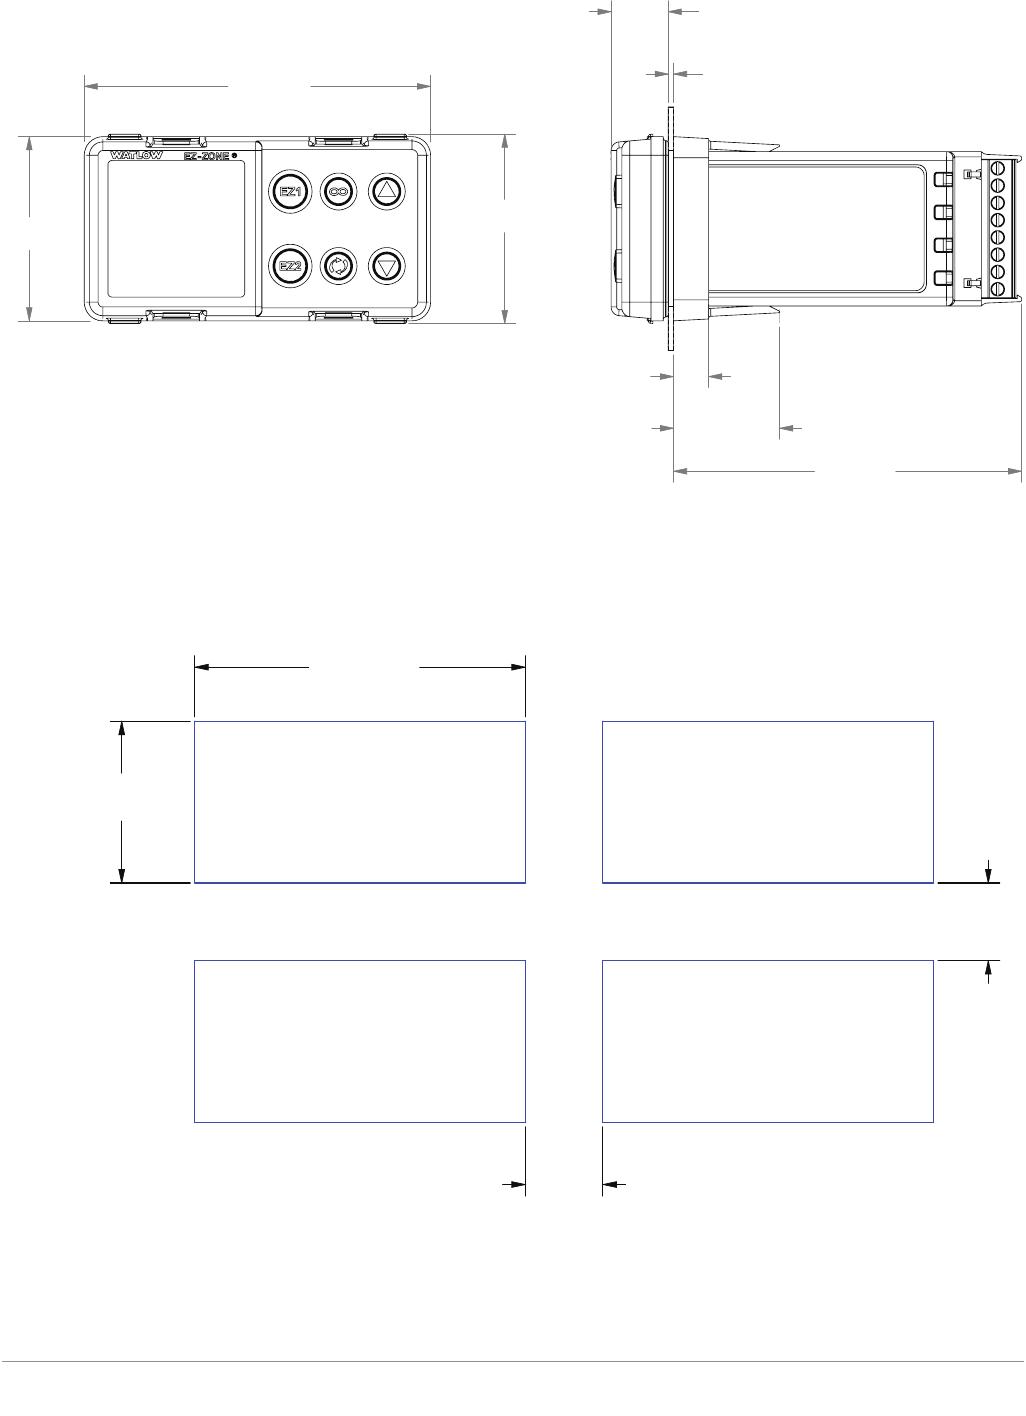 watlow ez zone wiring diagram